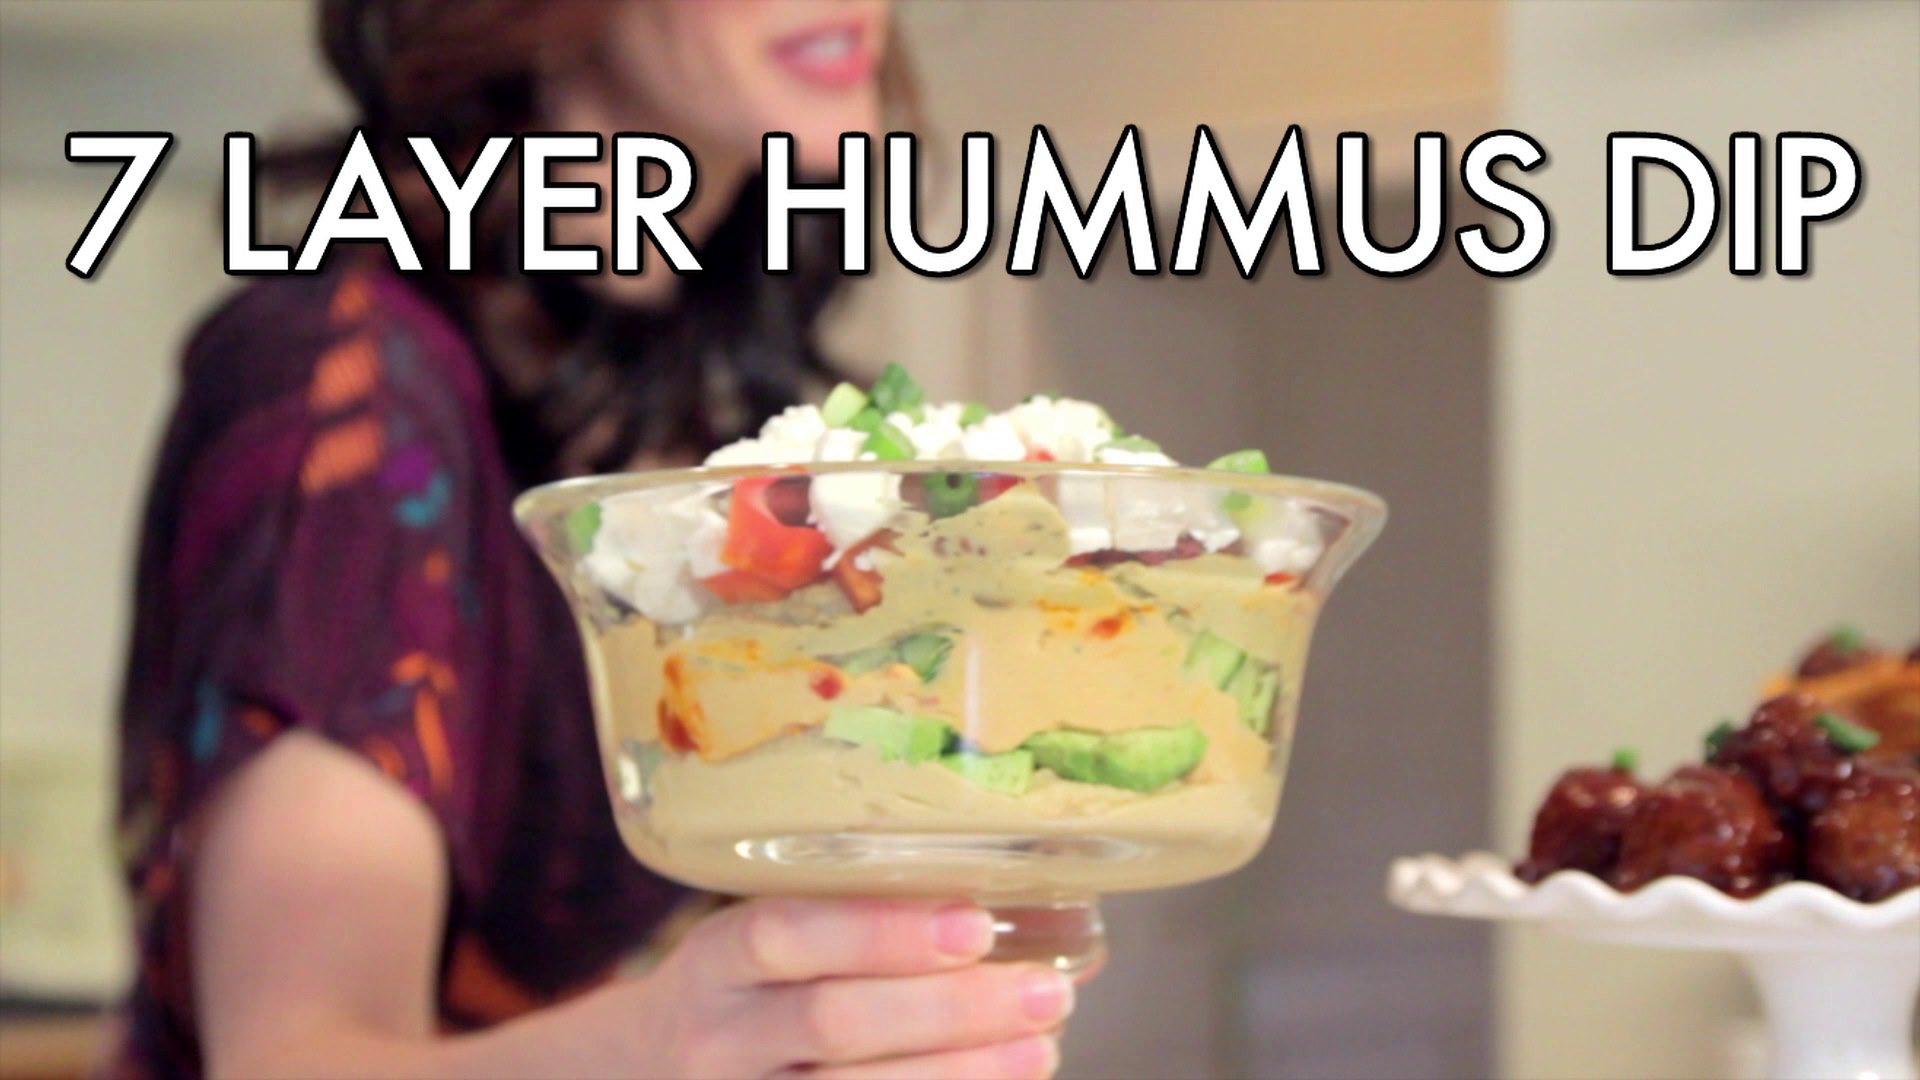 Seven Layer Hummus Dip